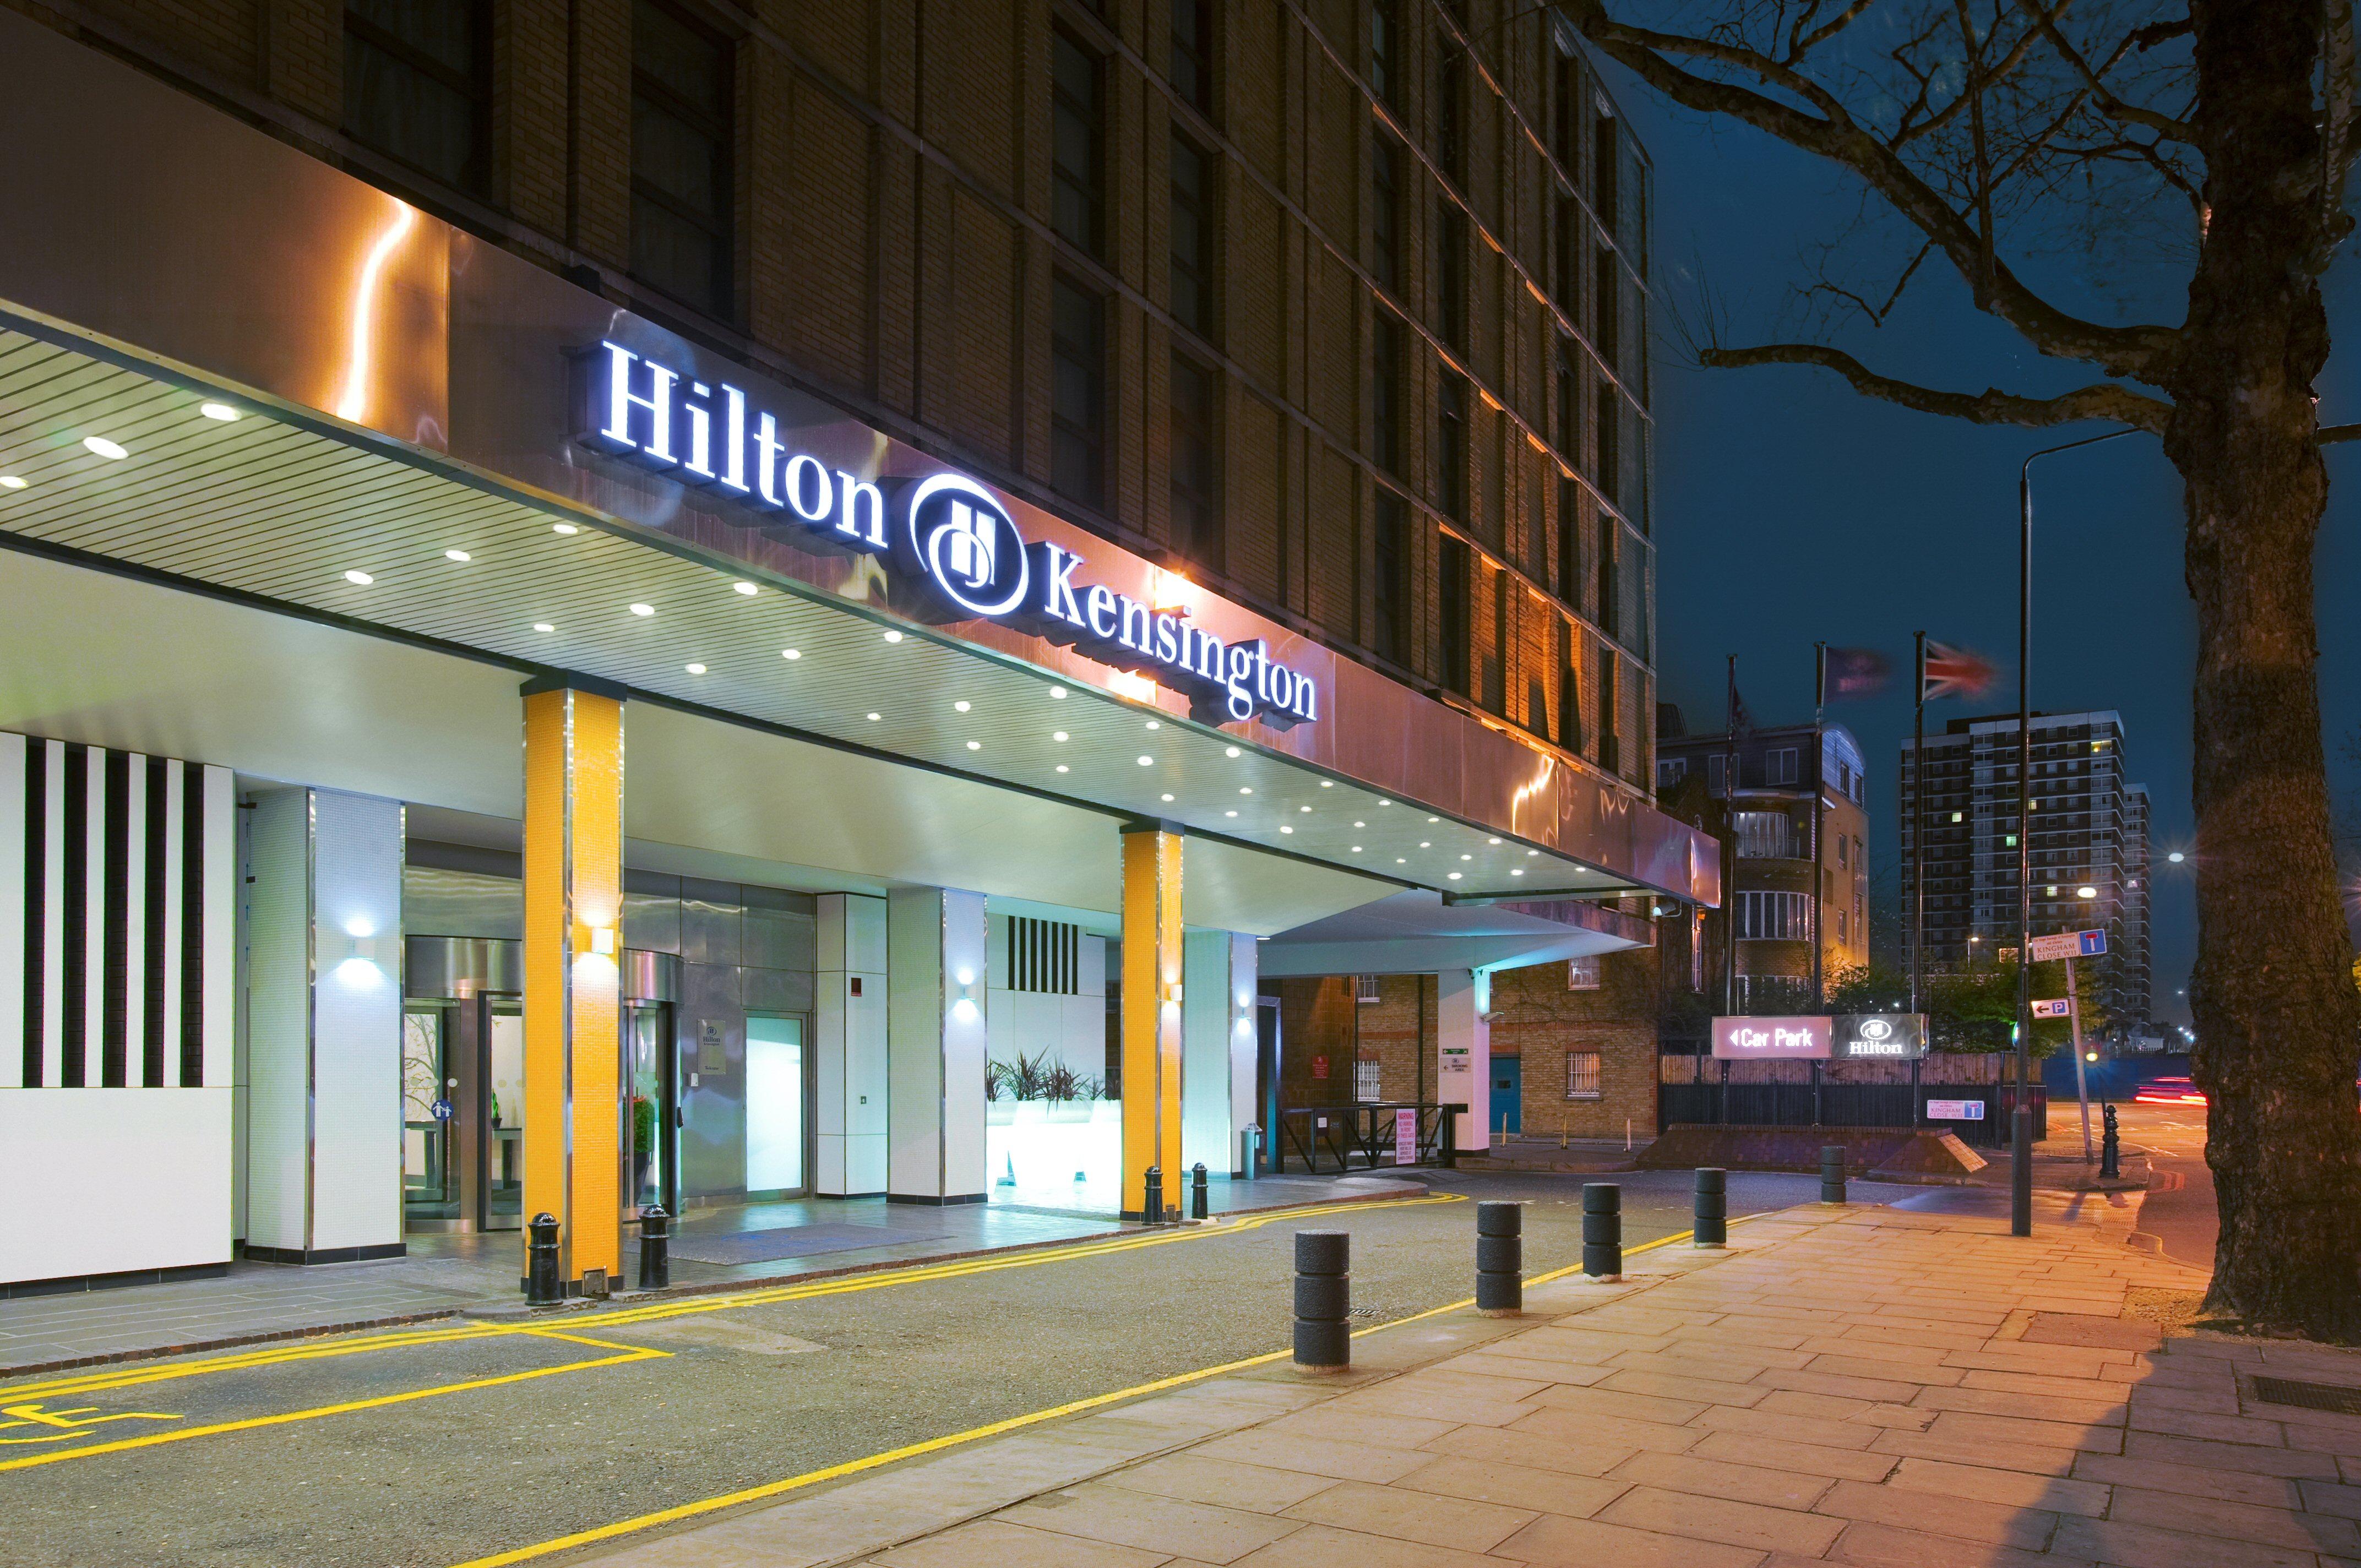 Kensington Hilton Hotel Holland Park